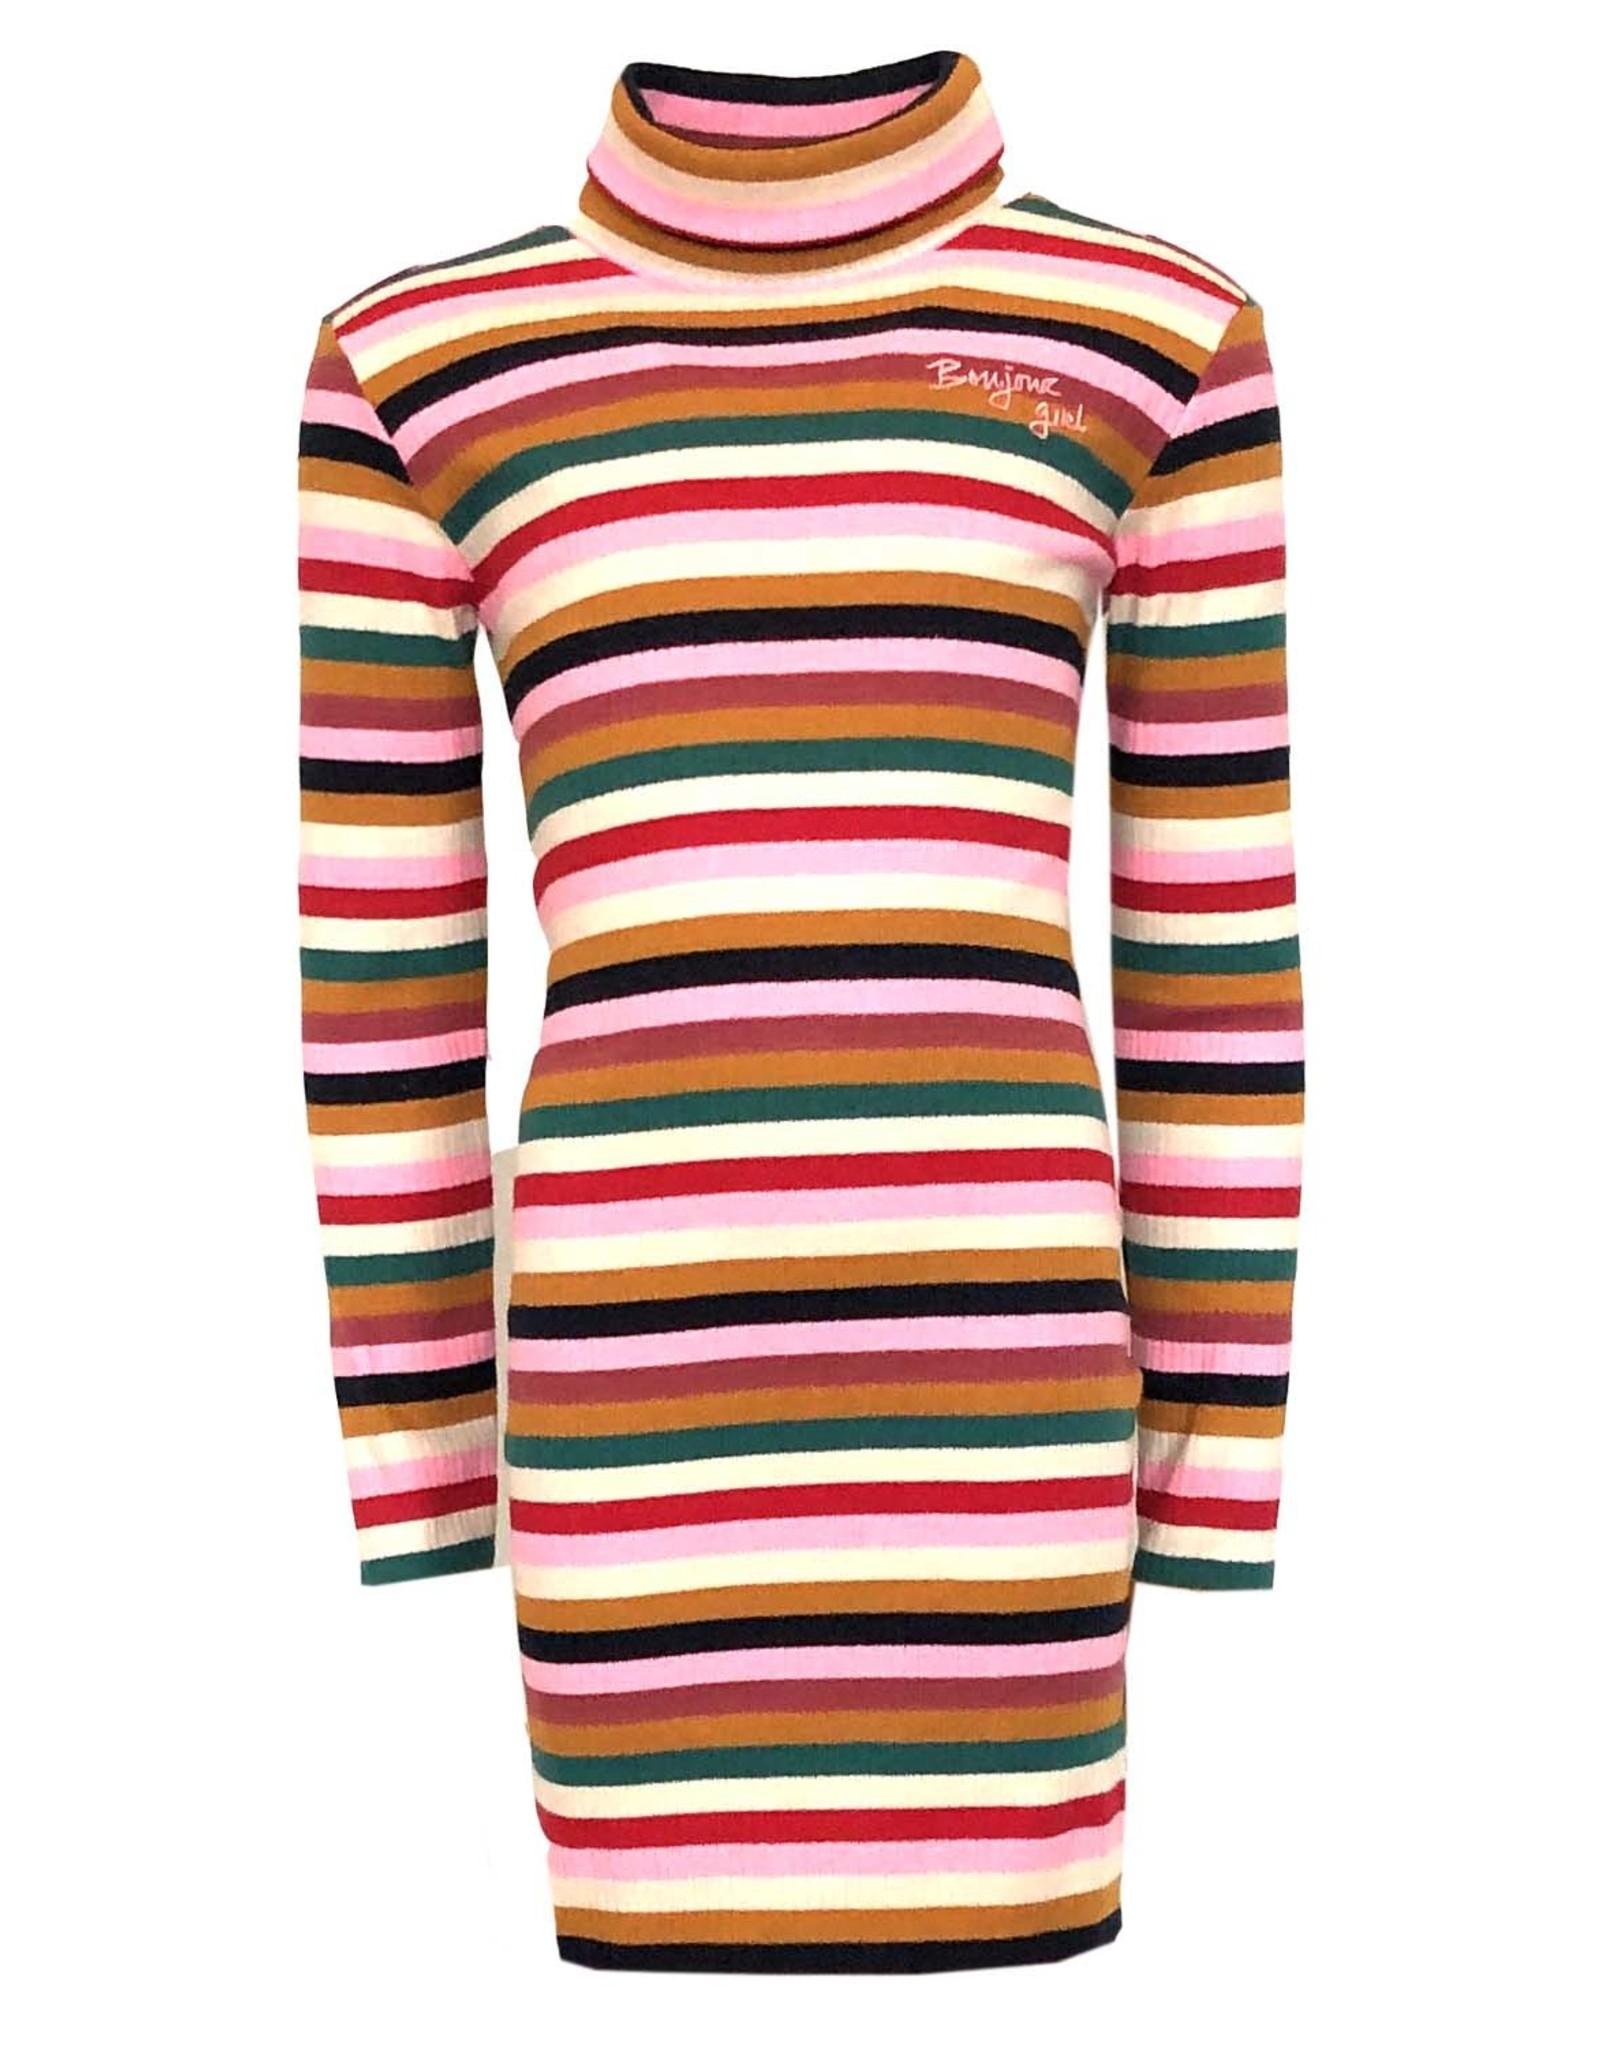 Topitm Topitm meiden rib jurk Aneli Multicolour